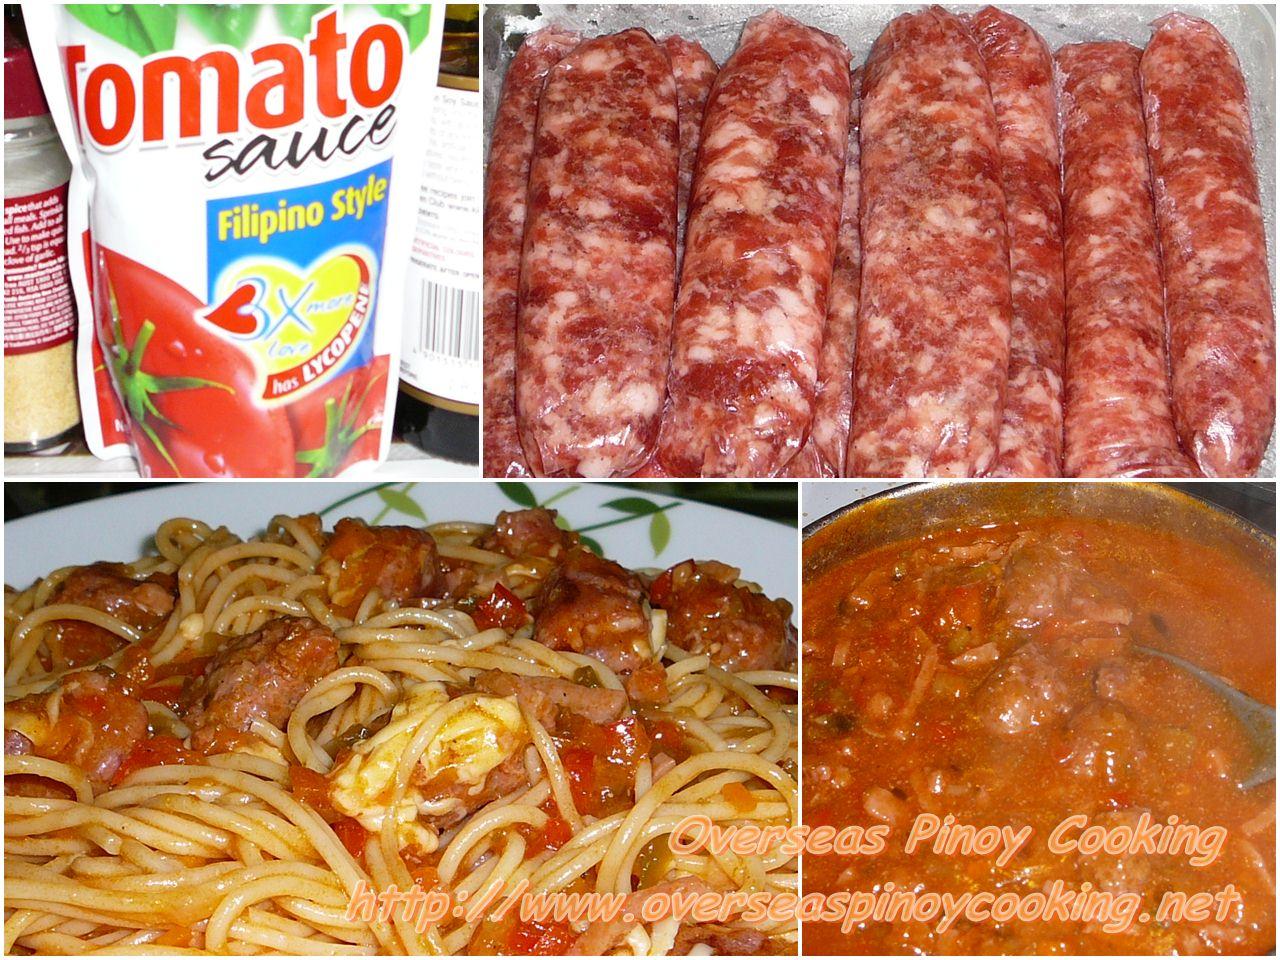 Pinoy Spaghetti with Sweet Longganisa - Cooking Procedure